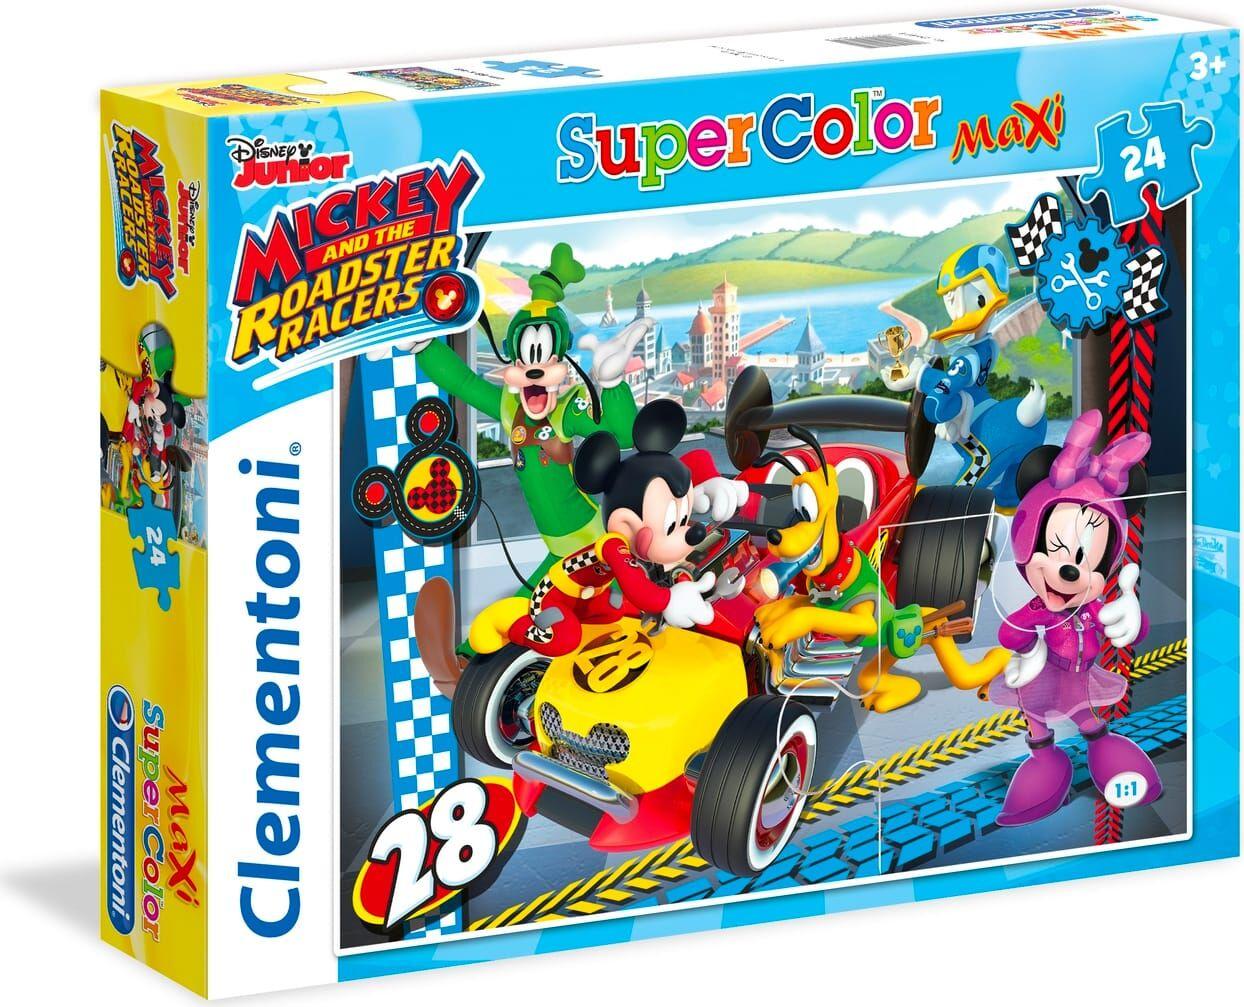 clementoni 24481 Mickey Roadster Racers - 24481